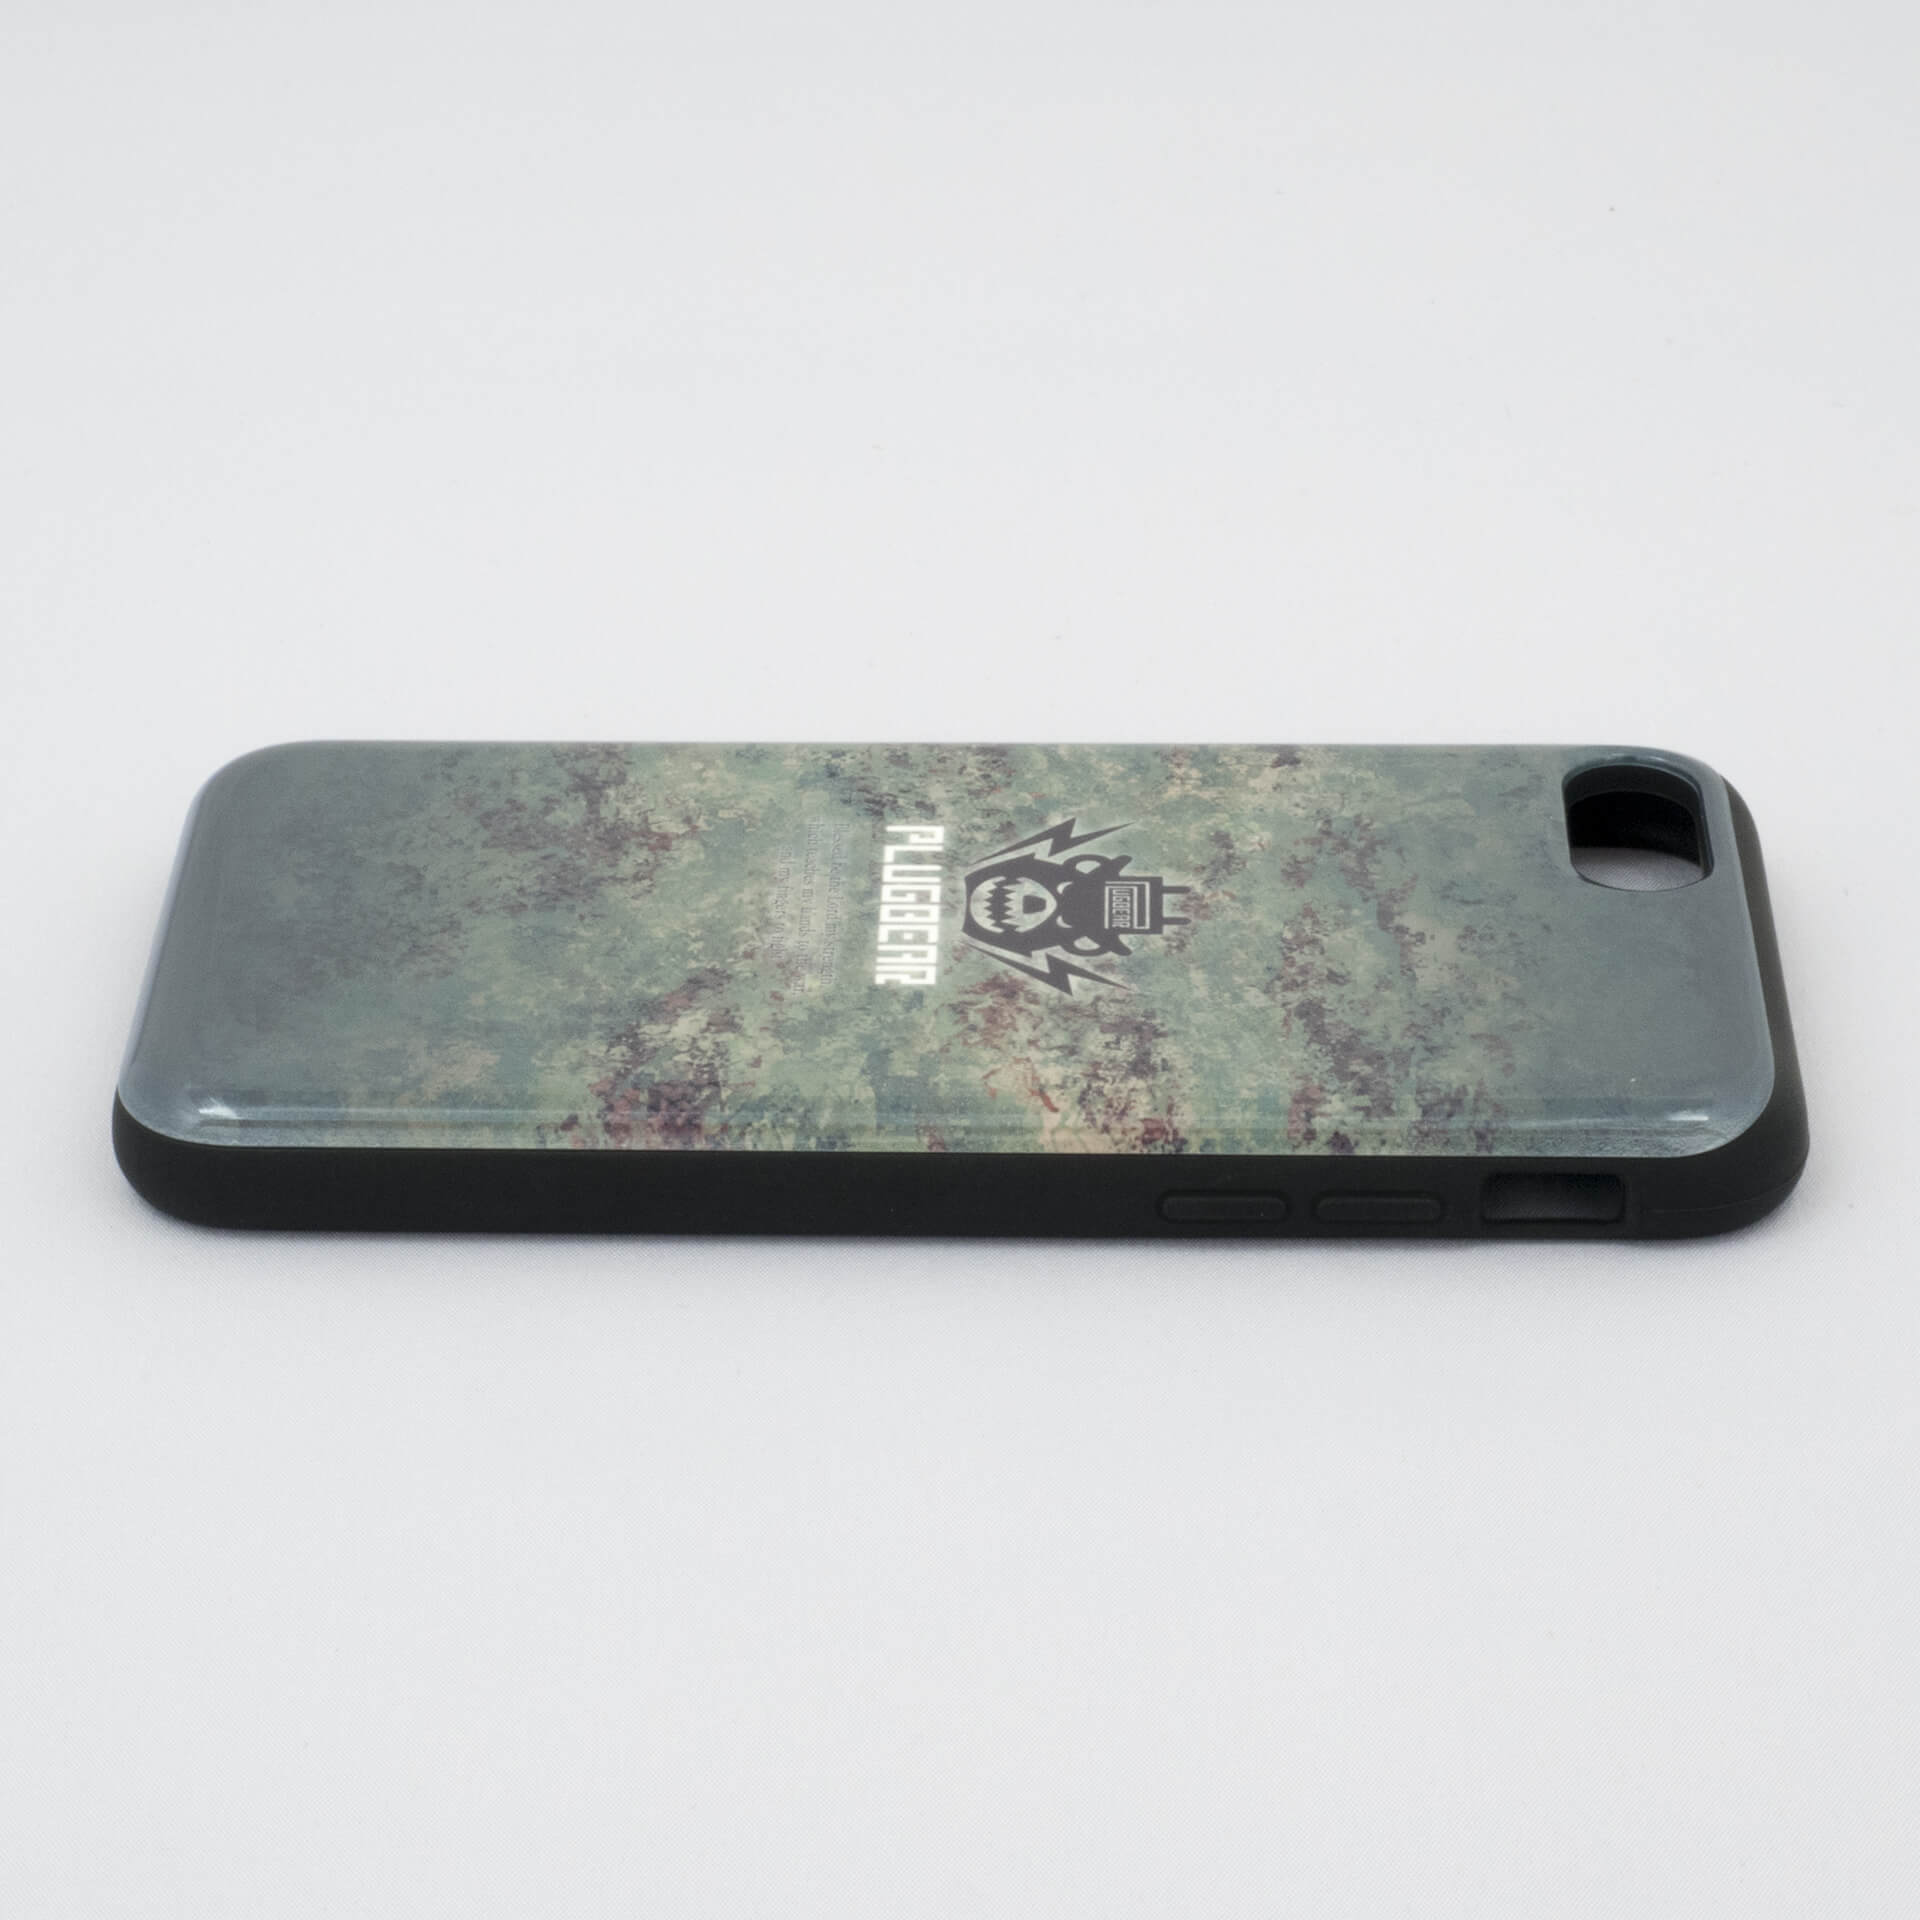 PLUGBEARのiPhoneケース画像3